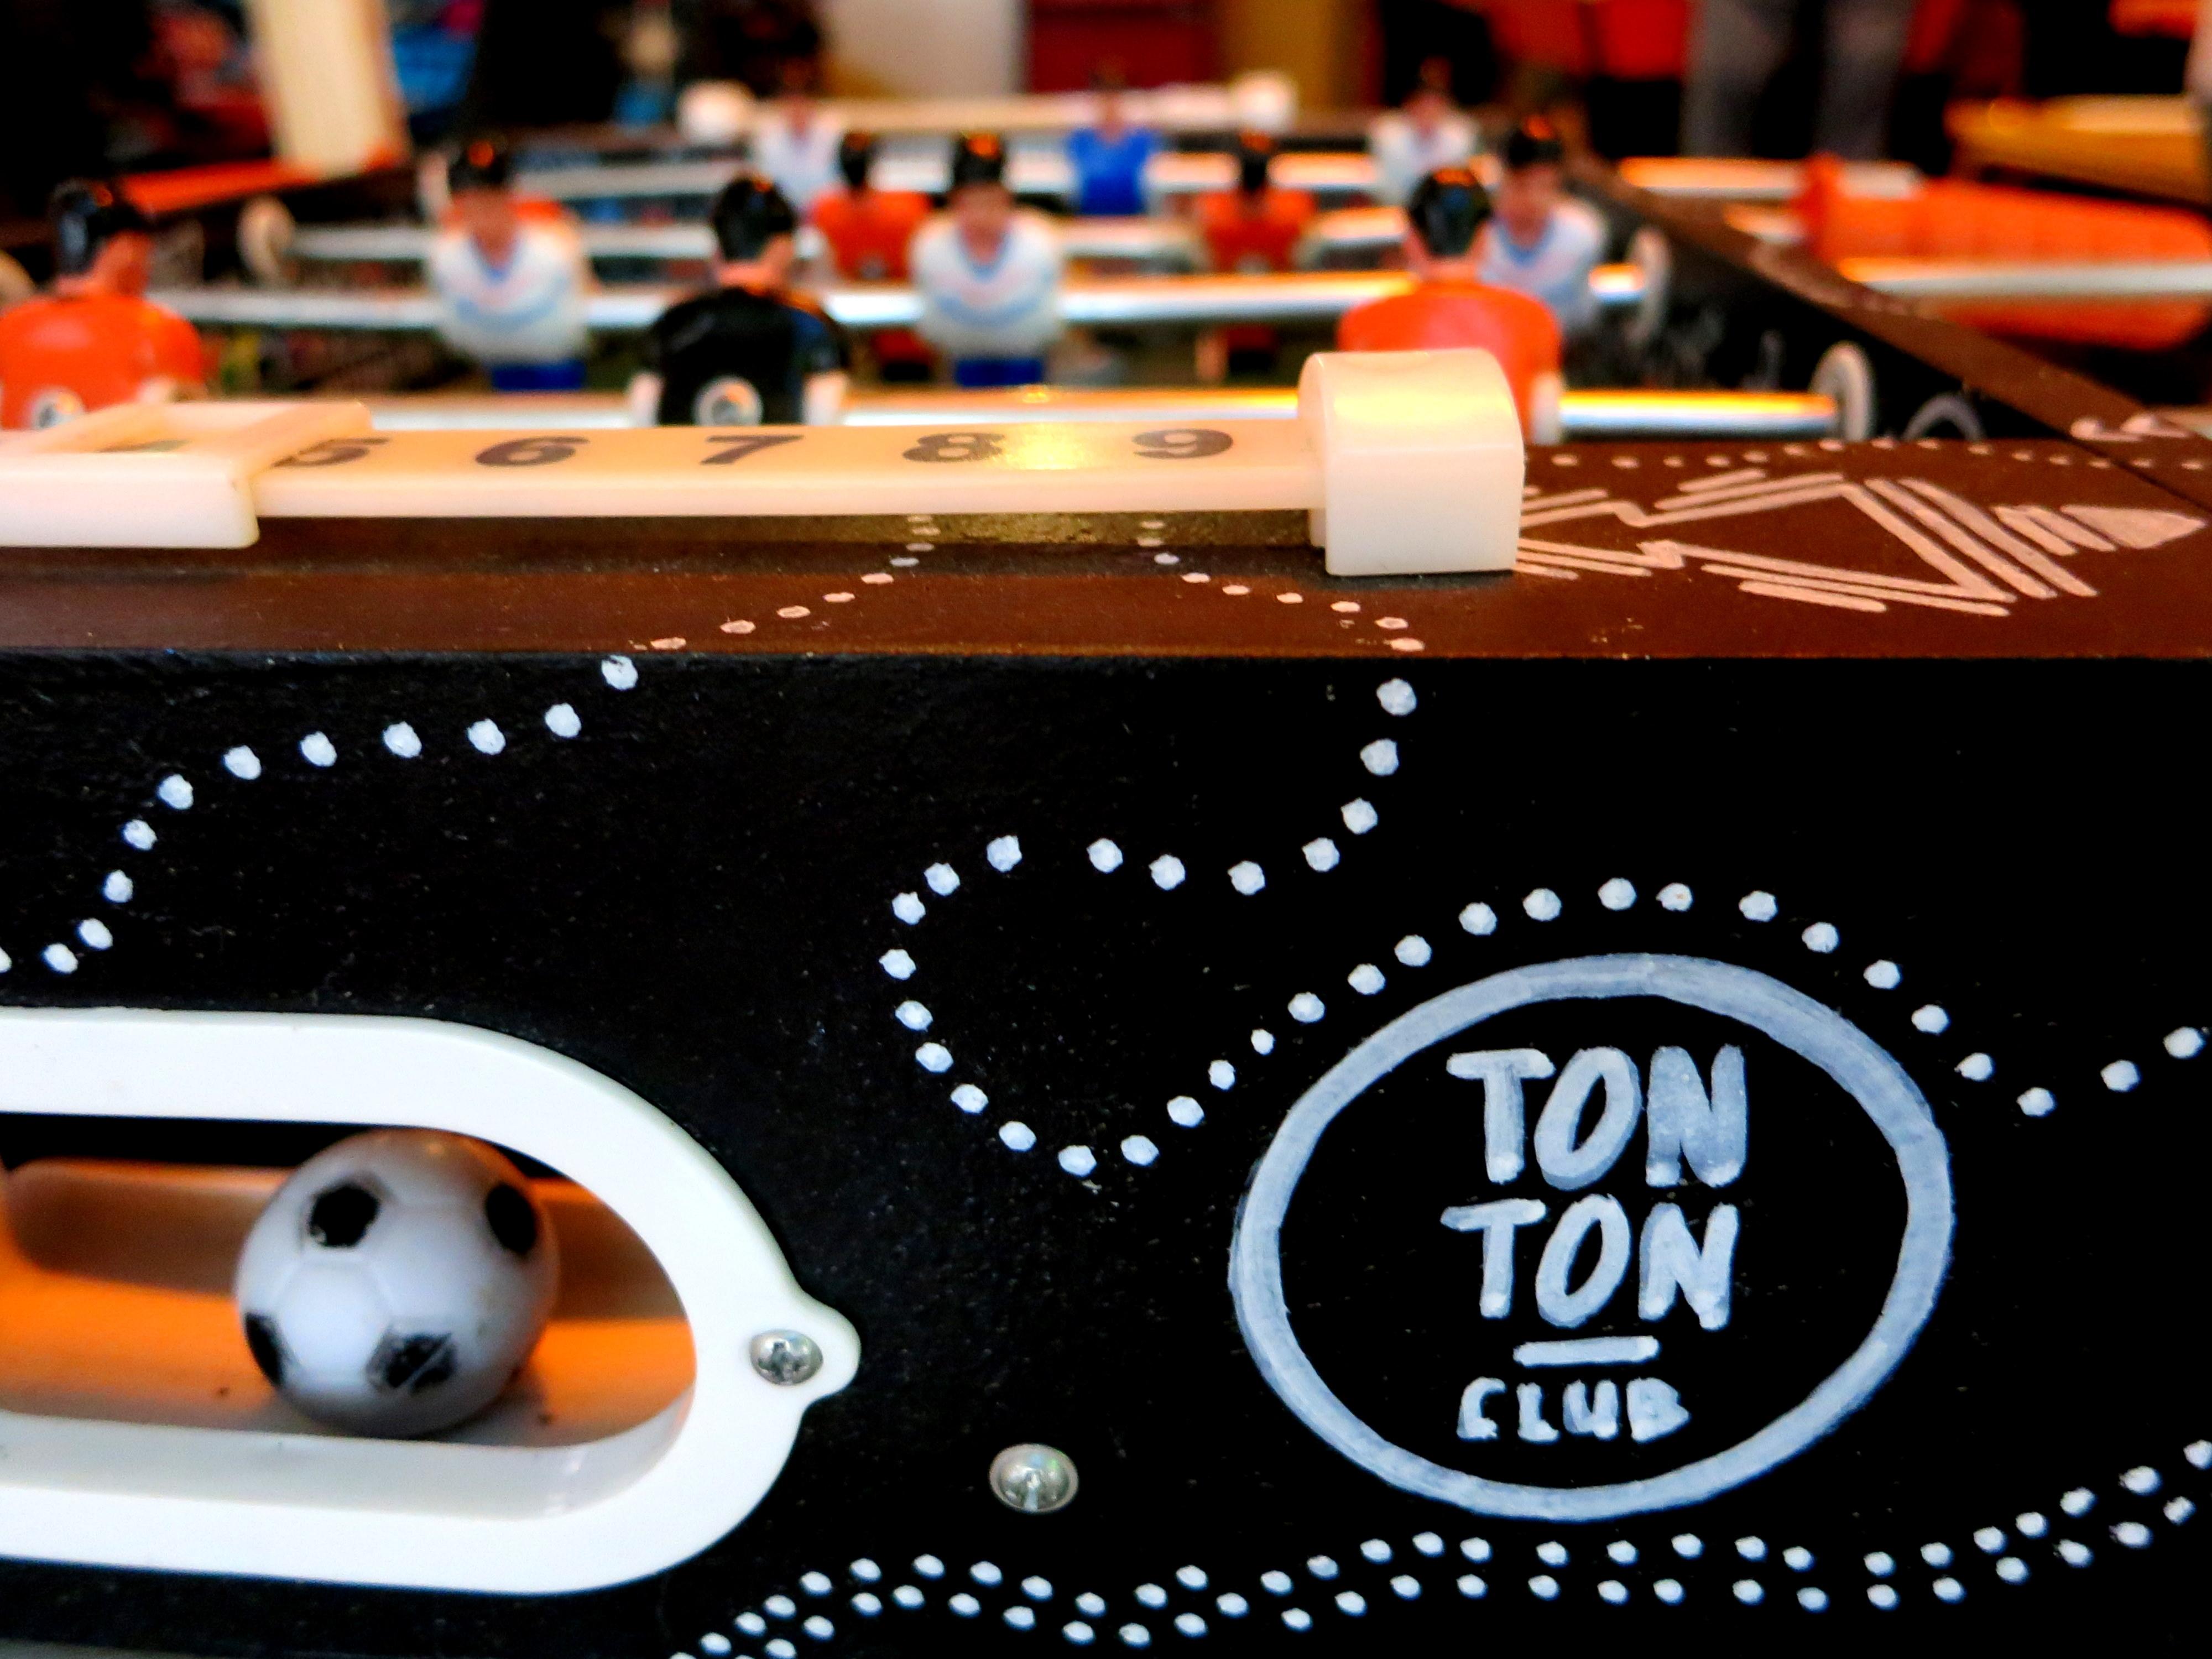 tontonclub2